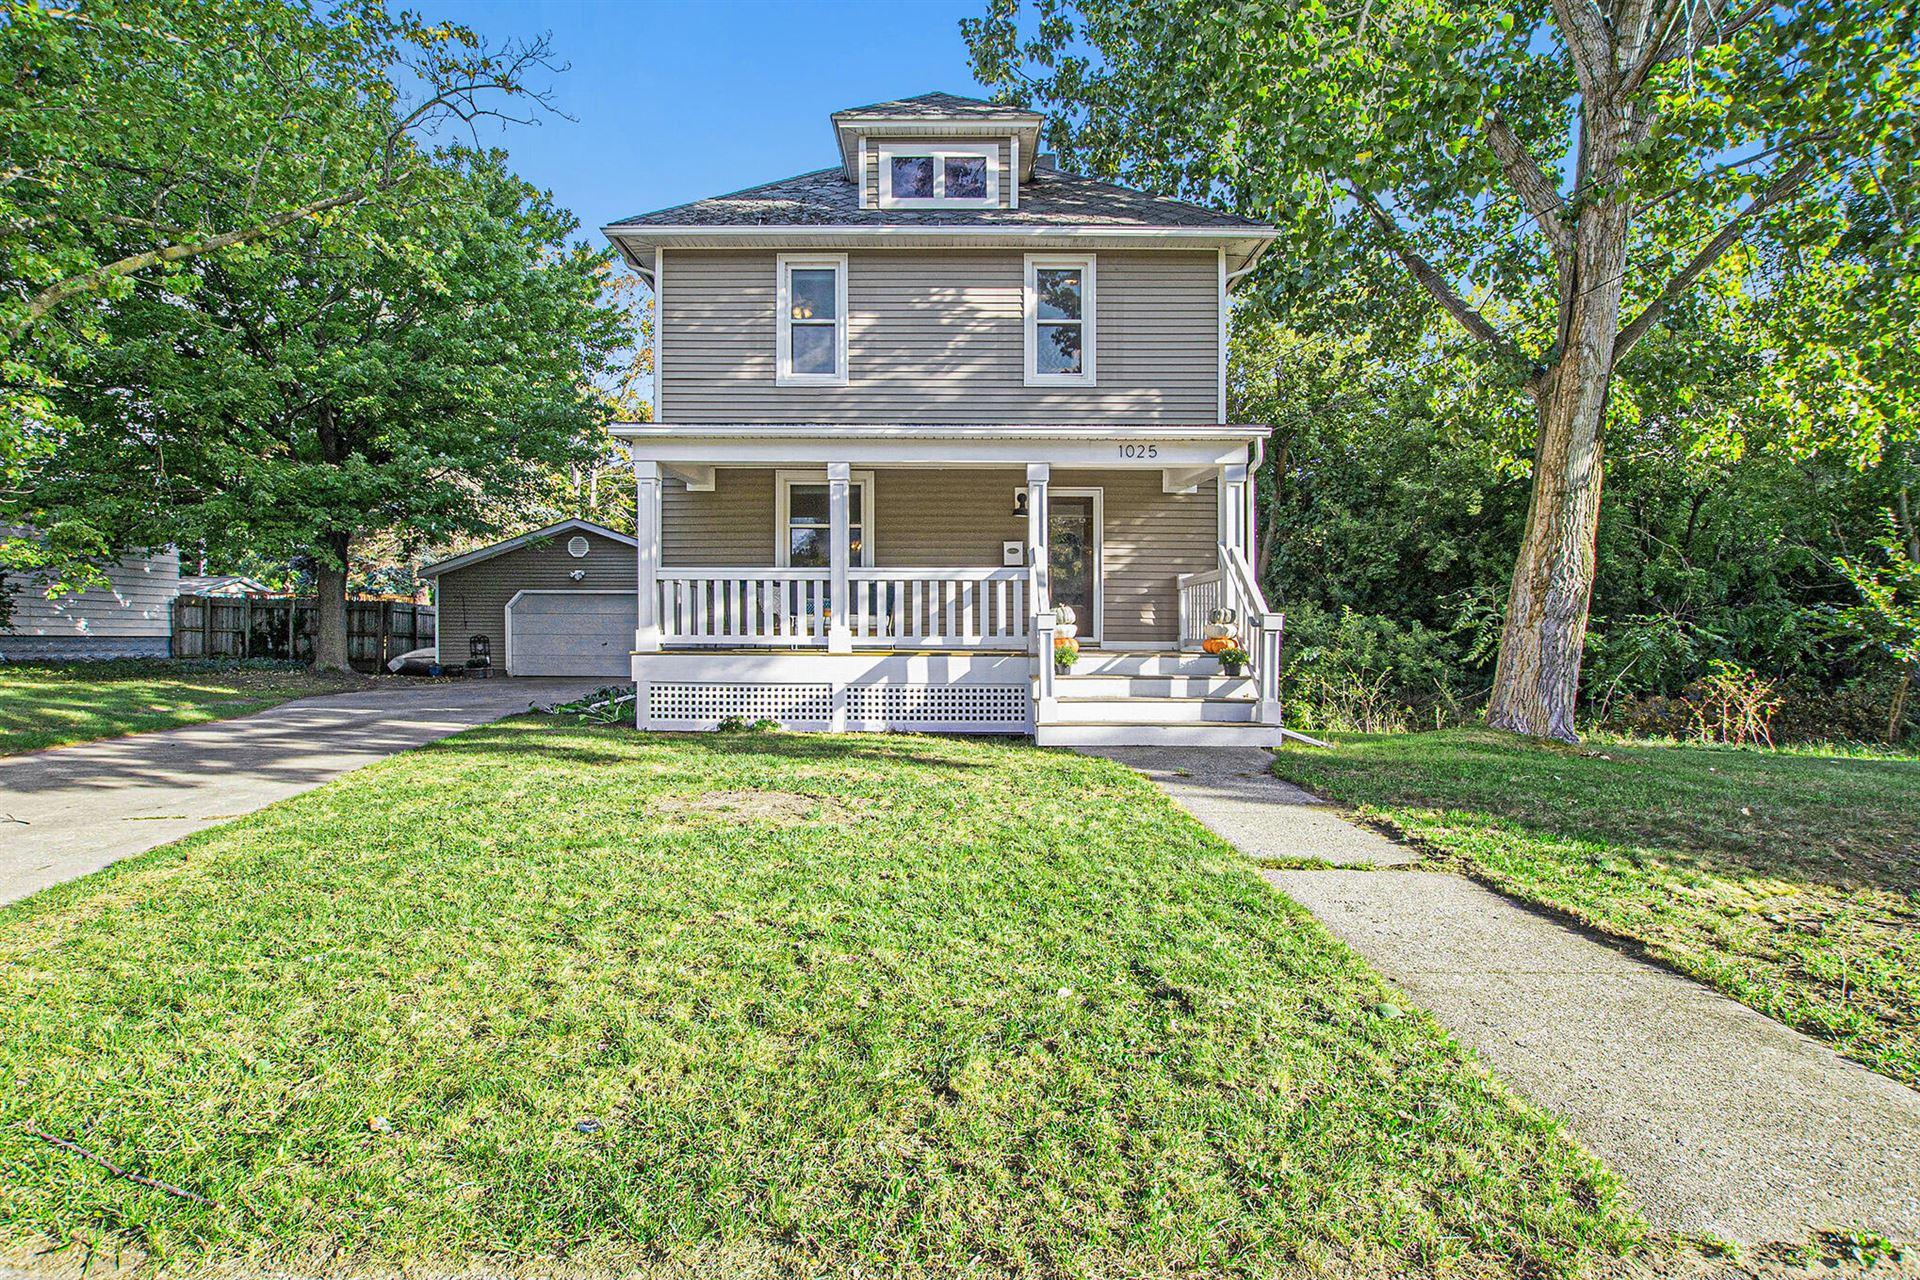 Photo of 1025 Fulton Street, Grand Haven, MI 49417 (MLS # 21108266)